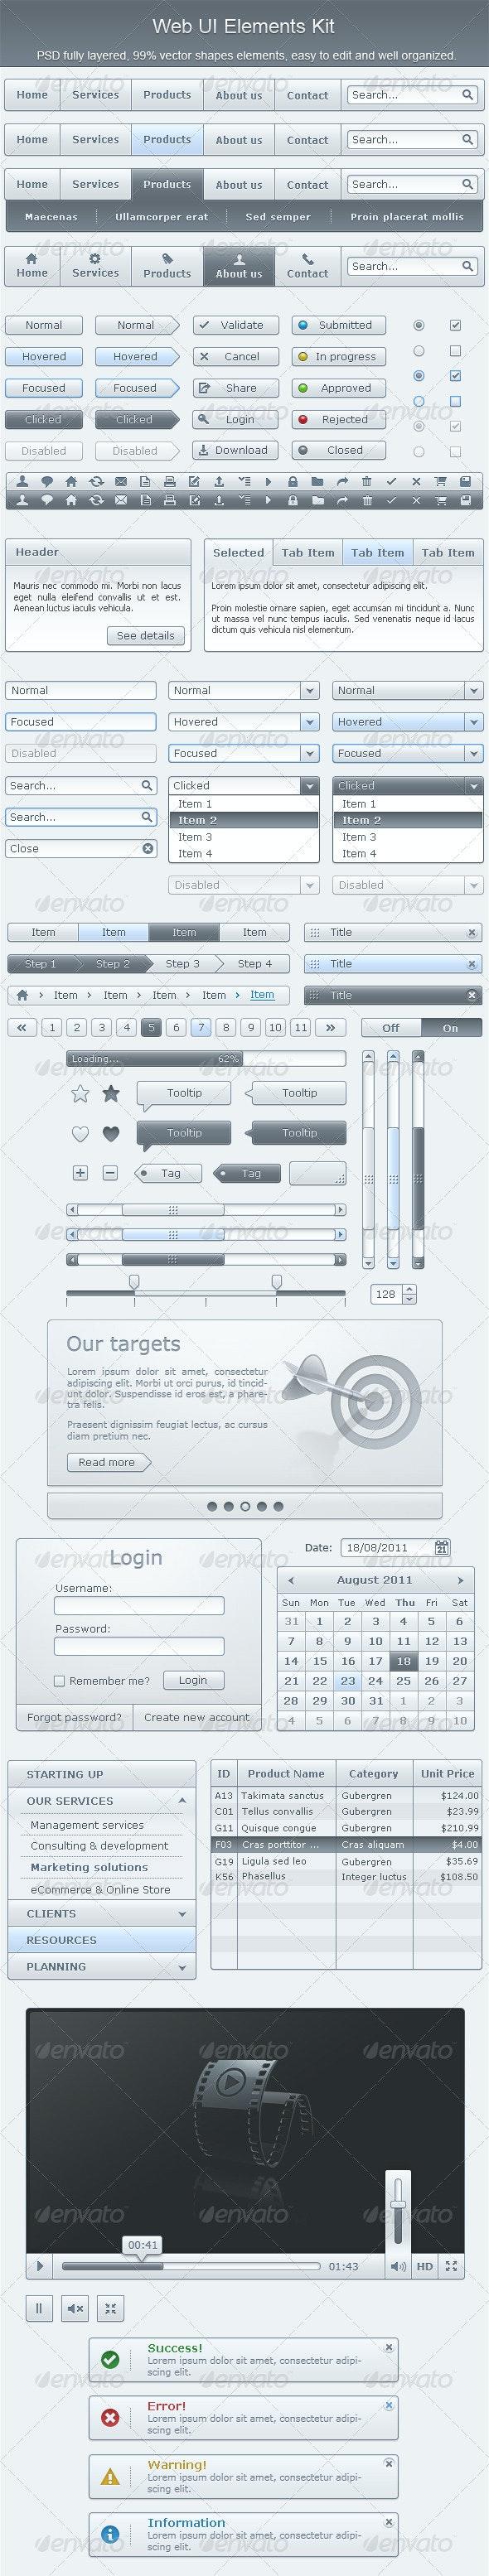 Web UI Elements Kit